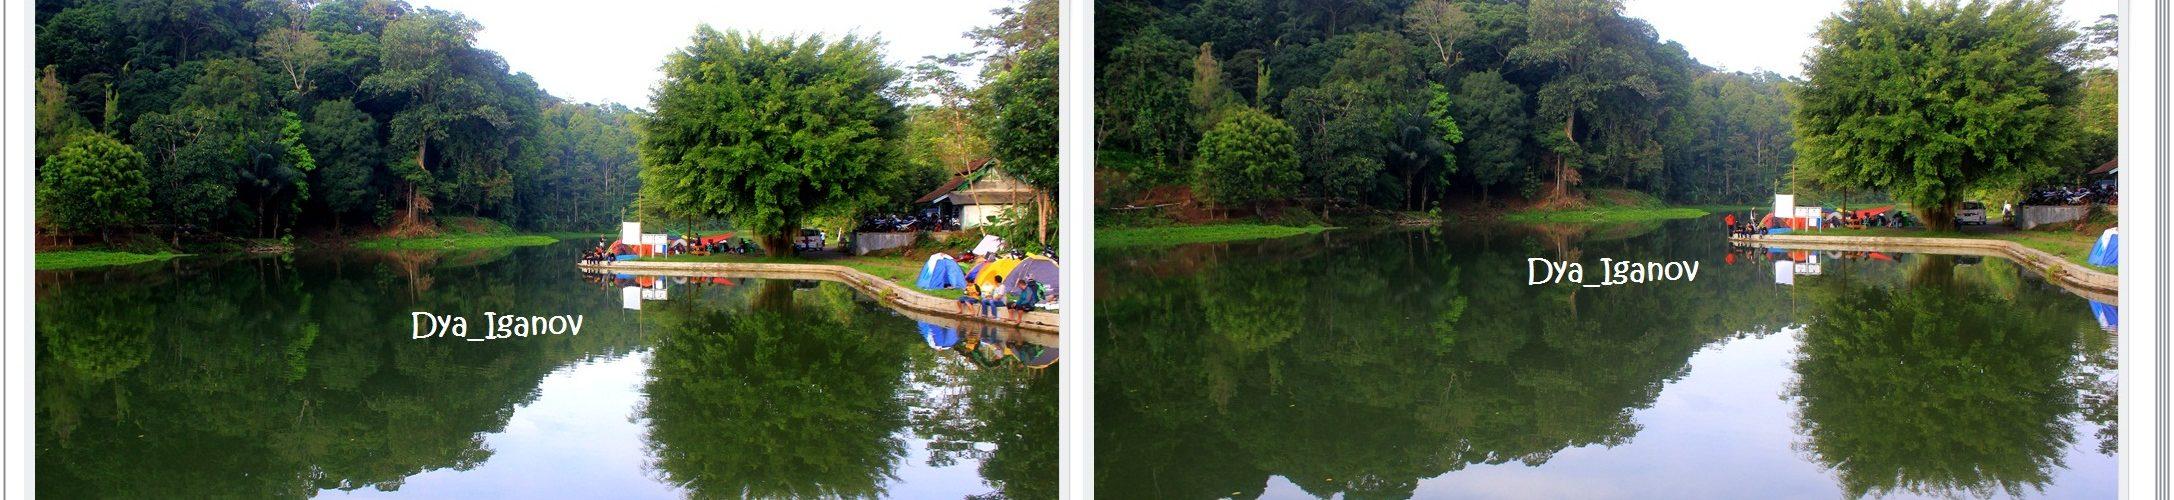 Desa Padaherang, Kecamatan Sindangwangi, Kabupaten Majalengka, Jawa Barat